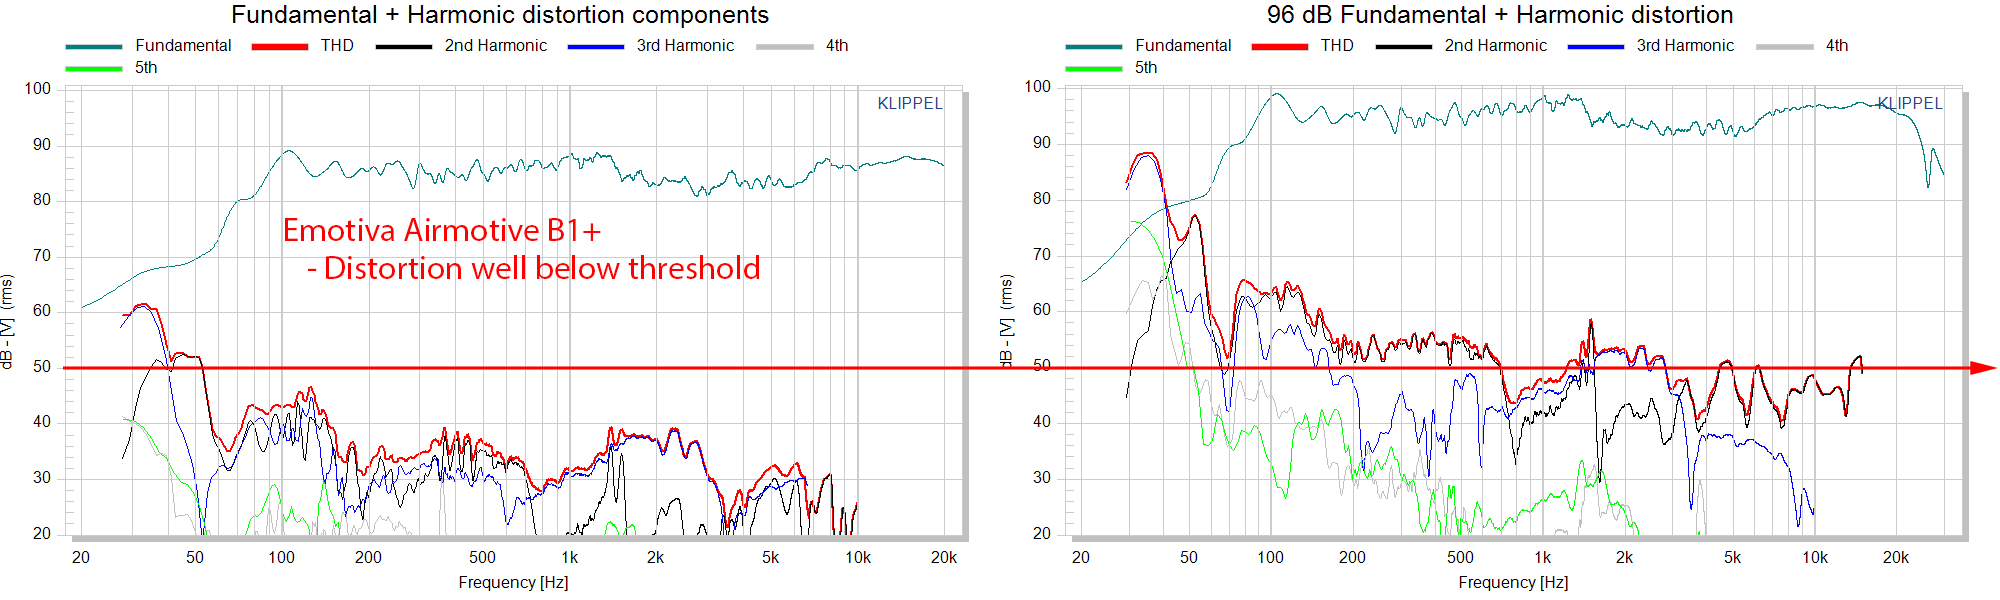 Emotiva Airmotiv B1+ THD distortion measurements.png